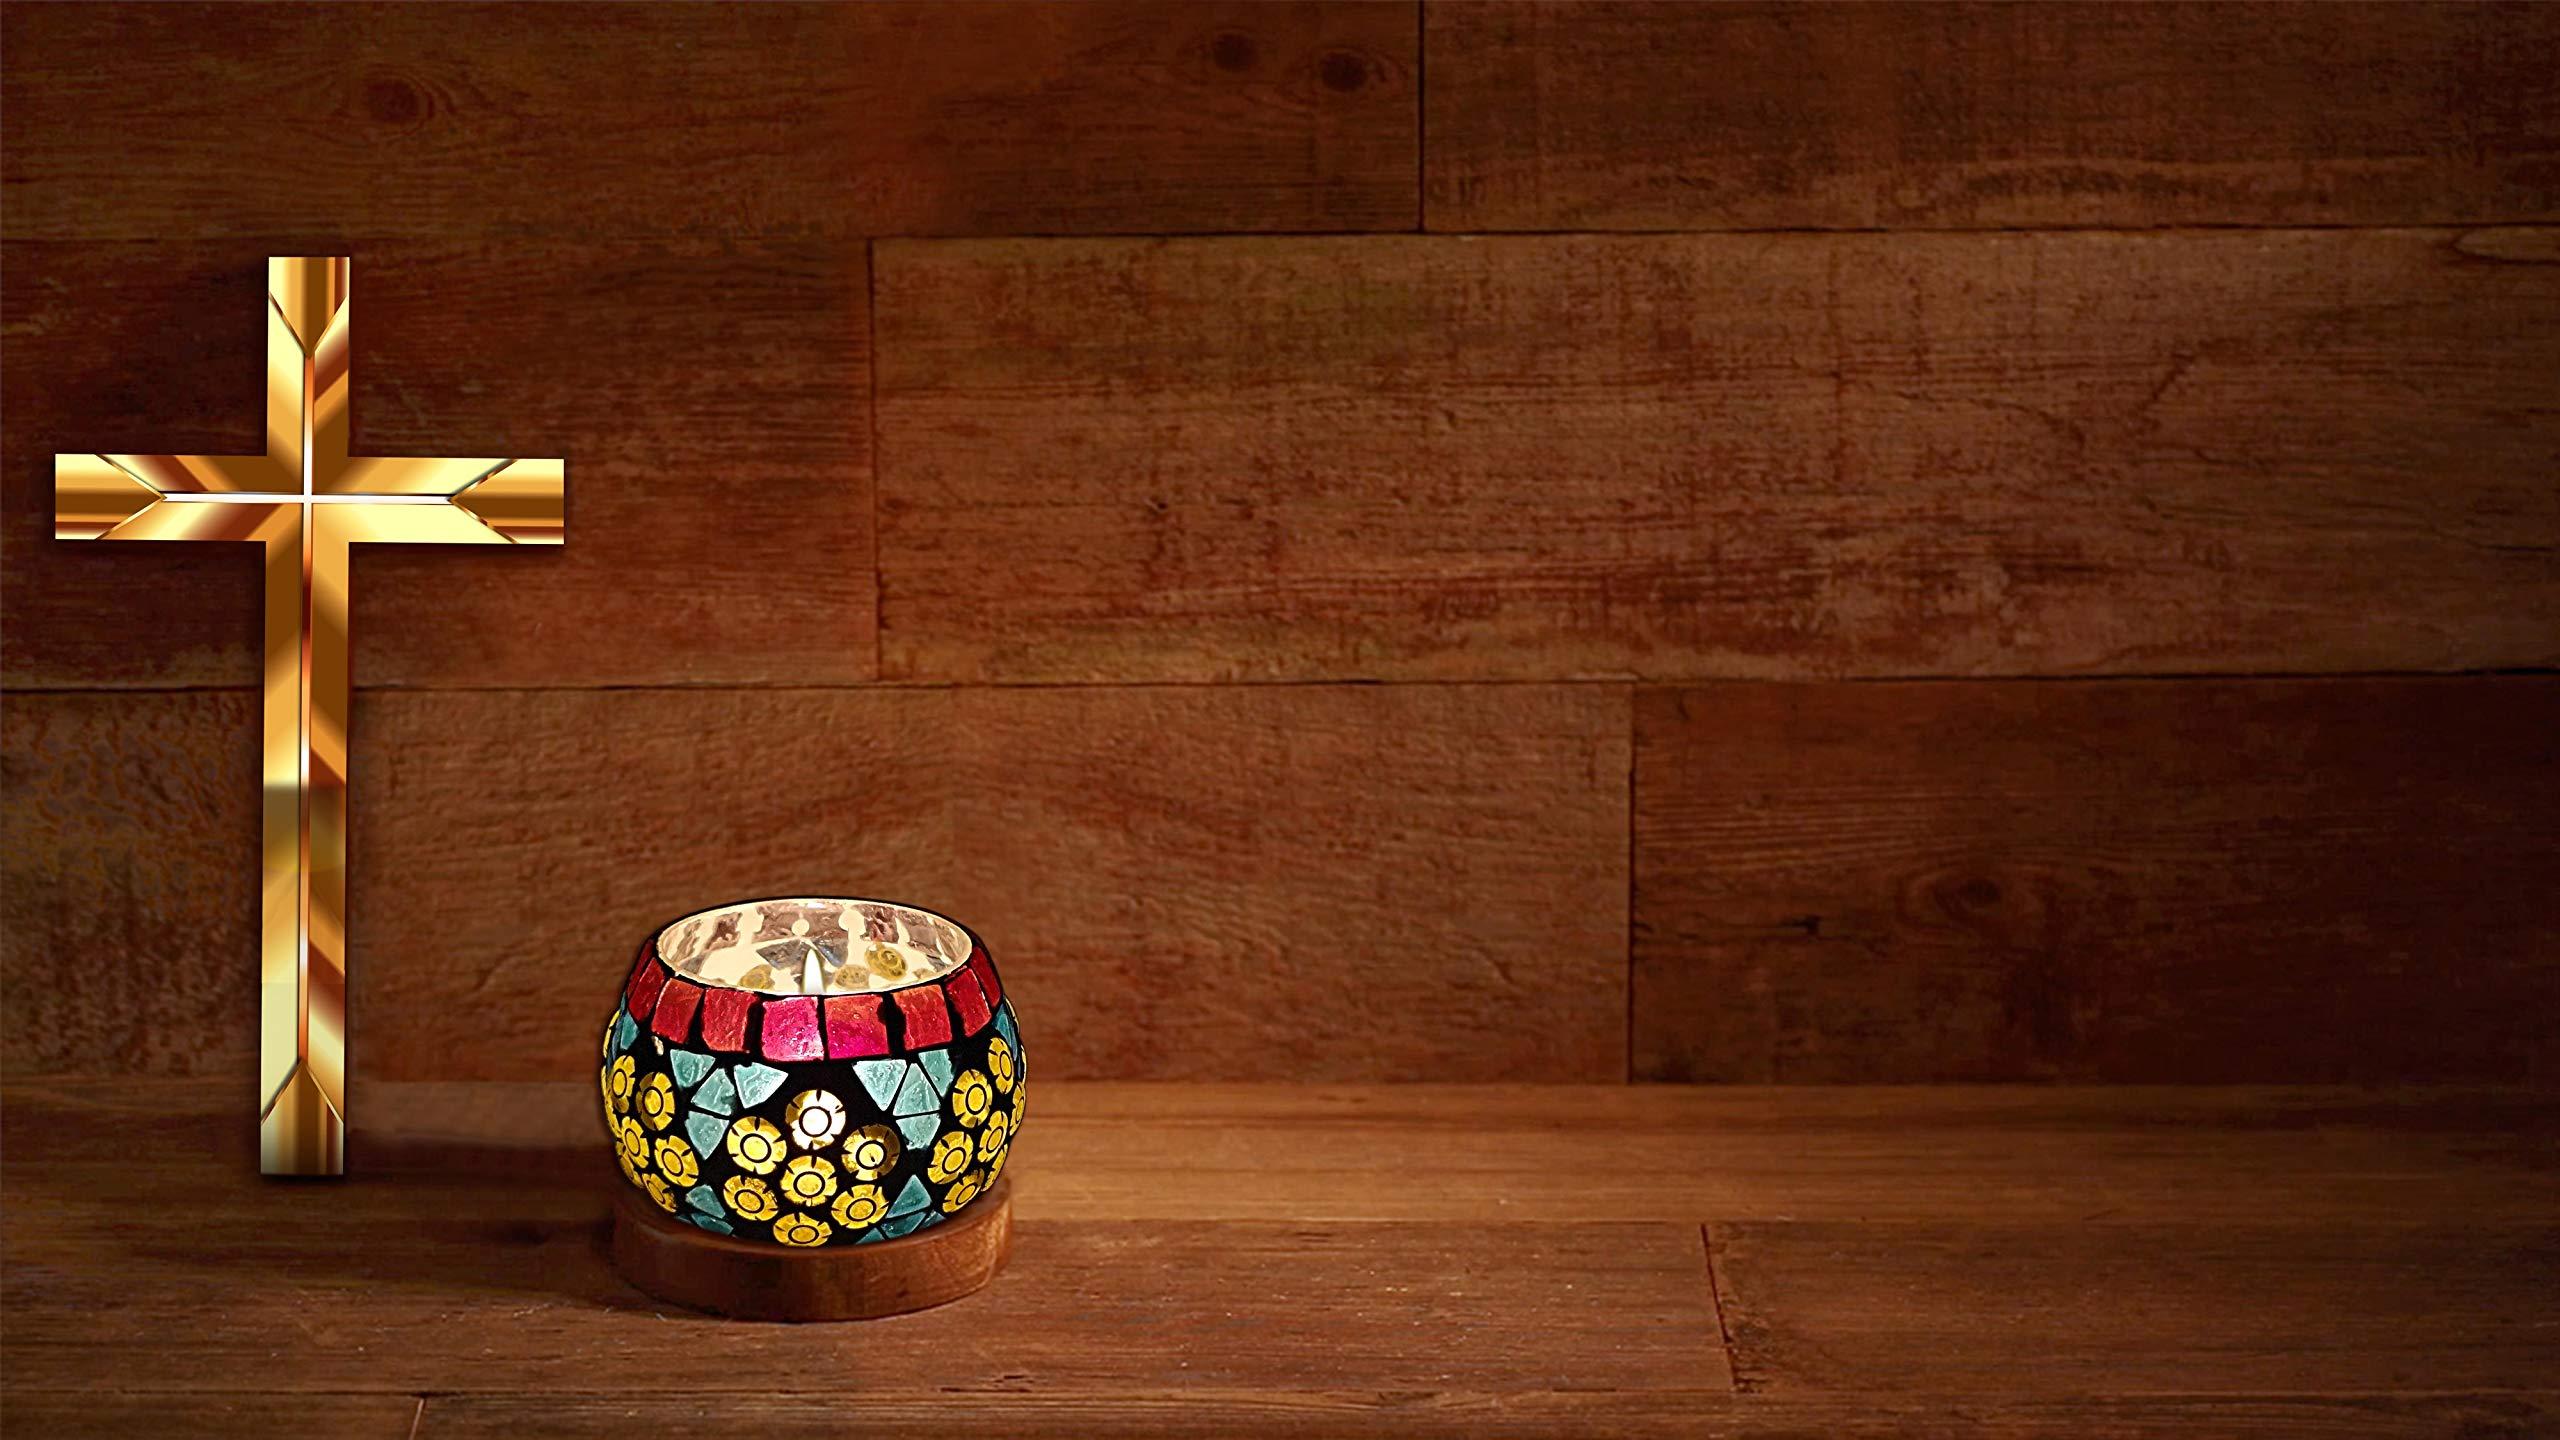 Hare Krishna Lighting Decorative Mosaic Glass Round Table Candle Holder Tea Light (Multi) 3 Inch